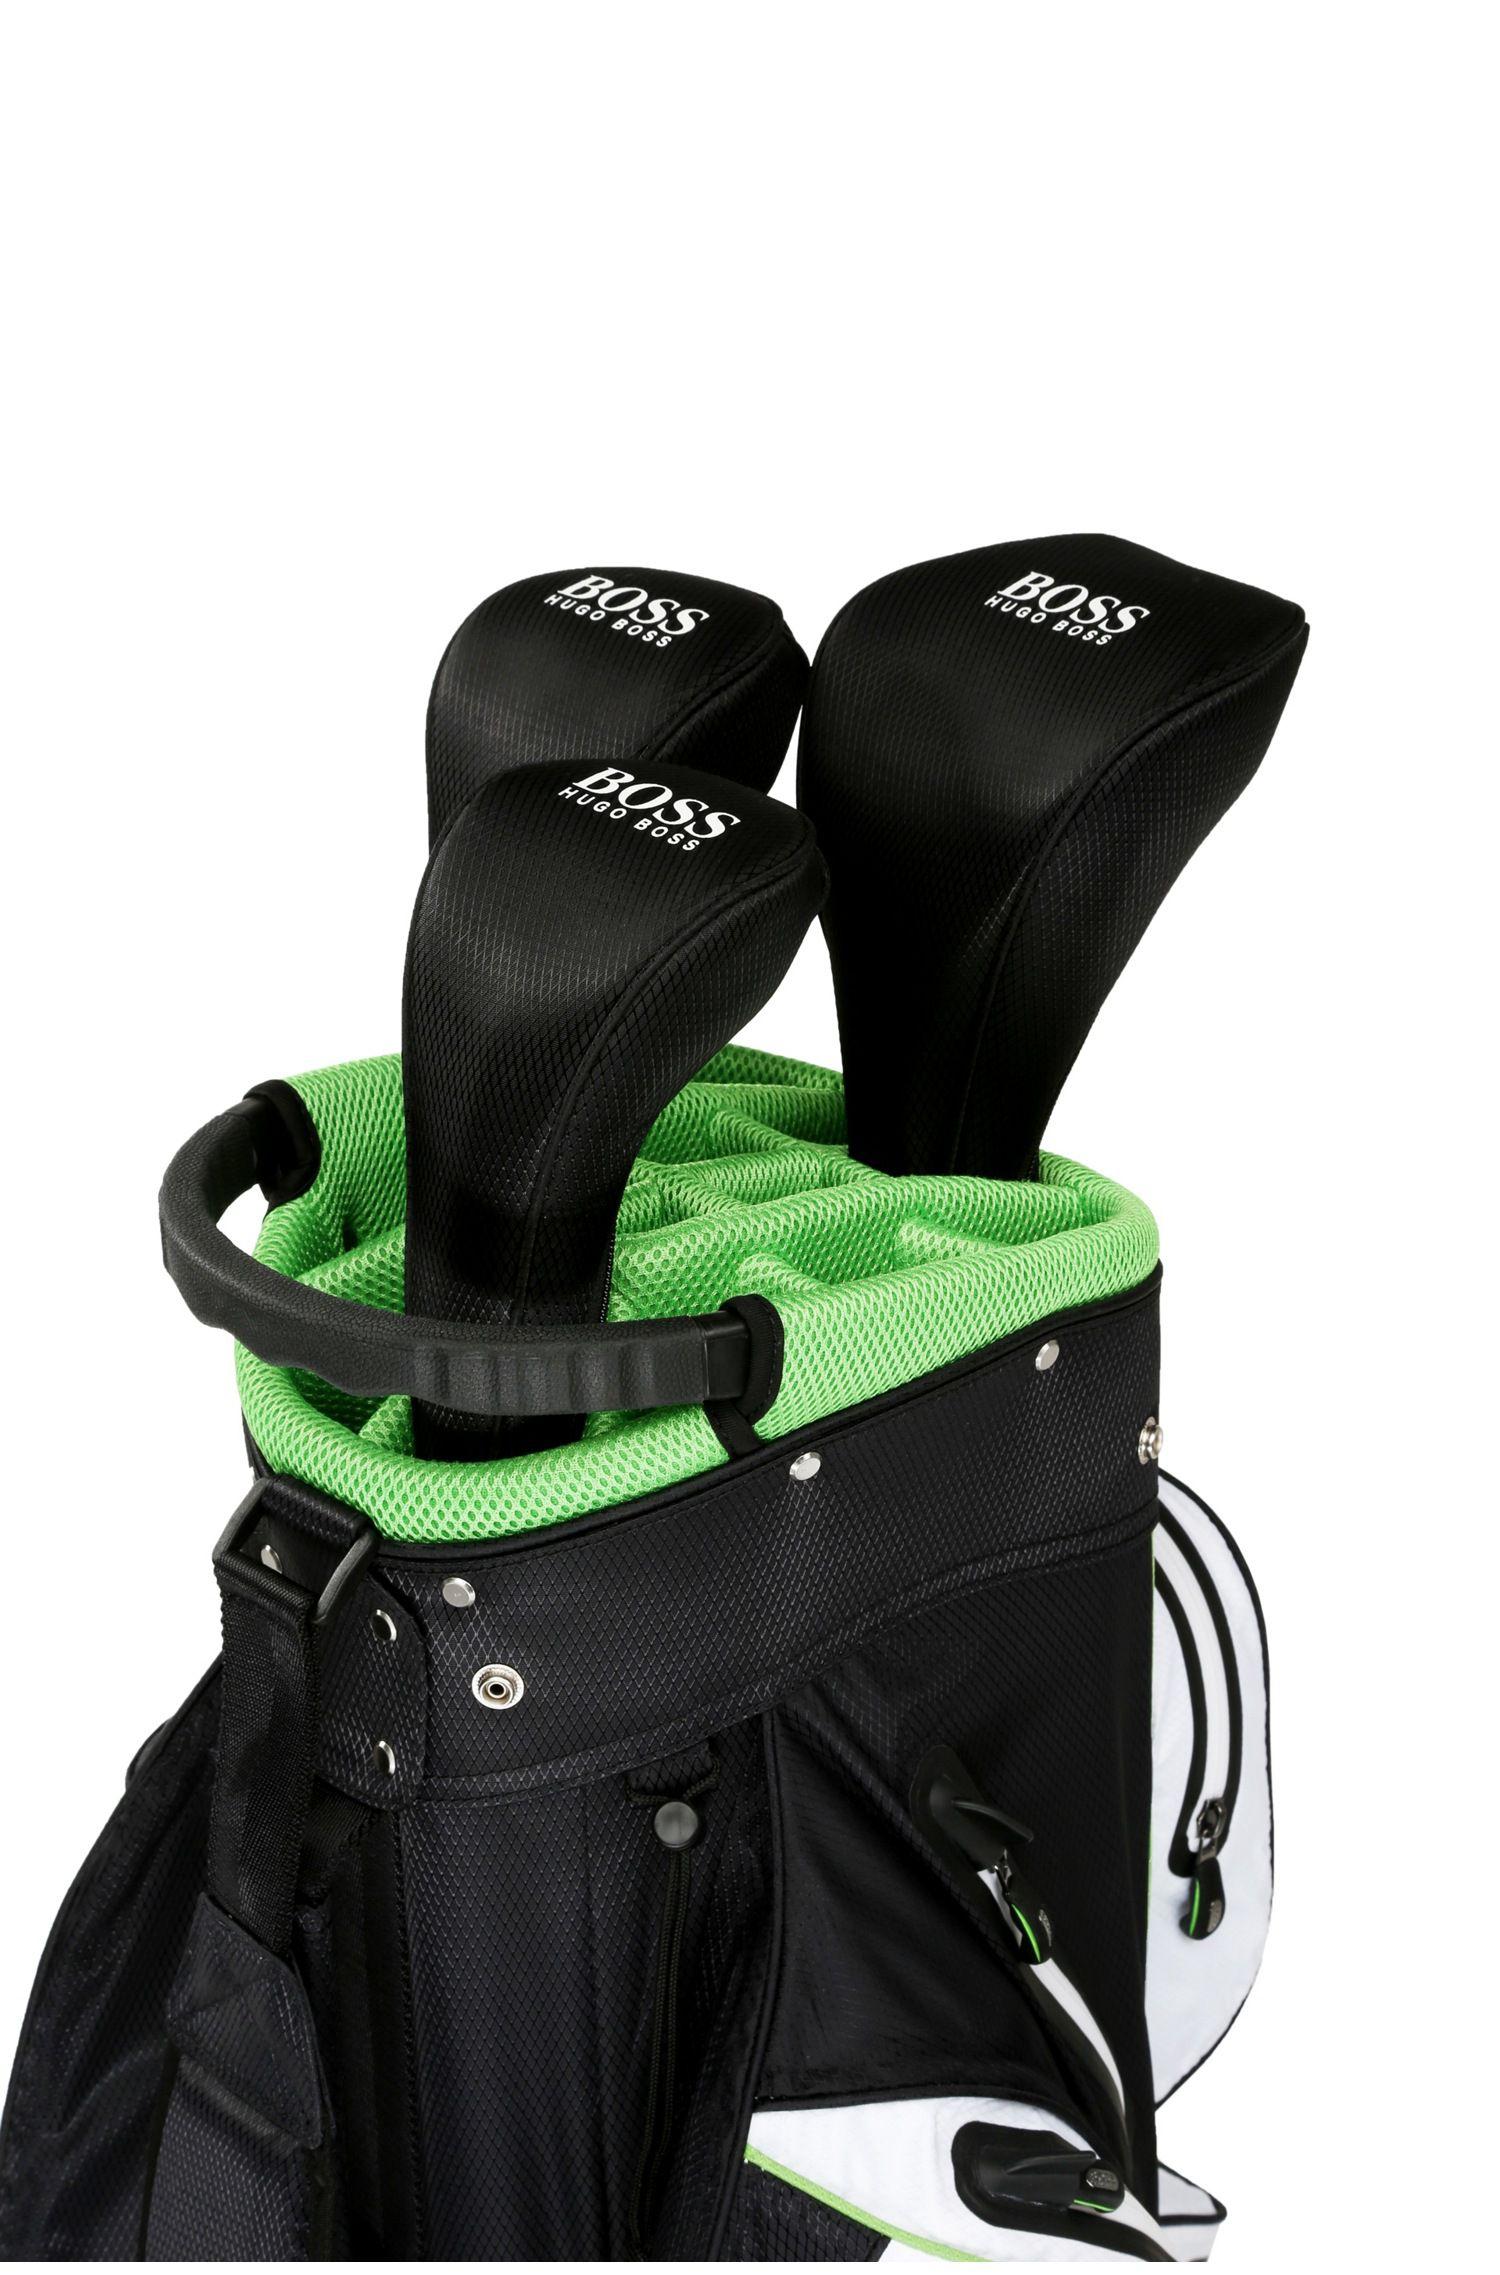 Schutzhüllen für Golfschläger: ´Golf_Covers`